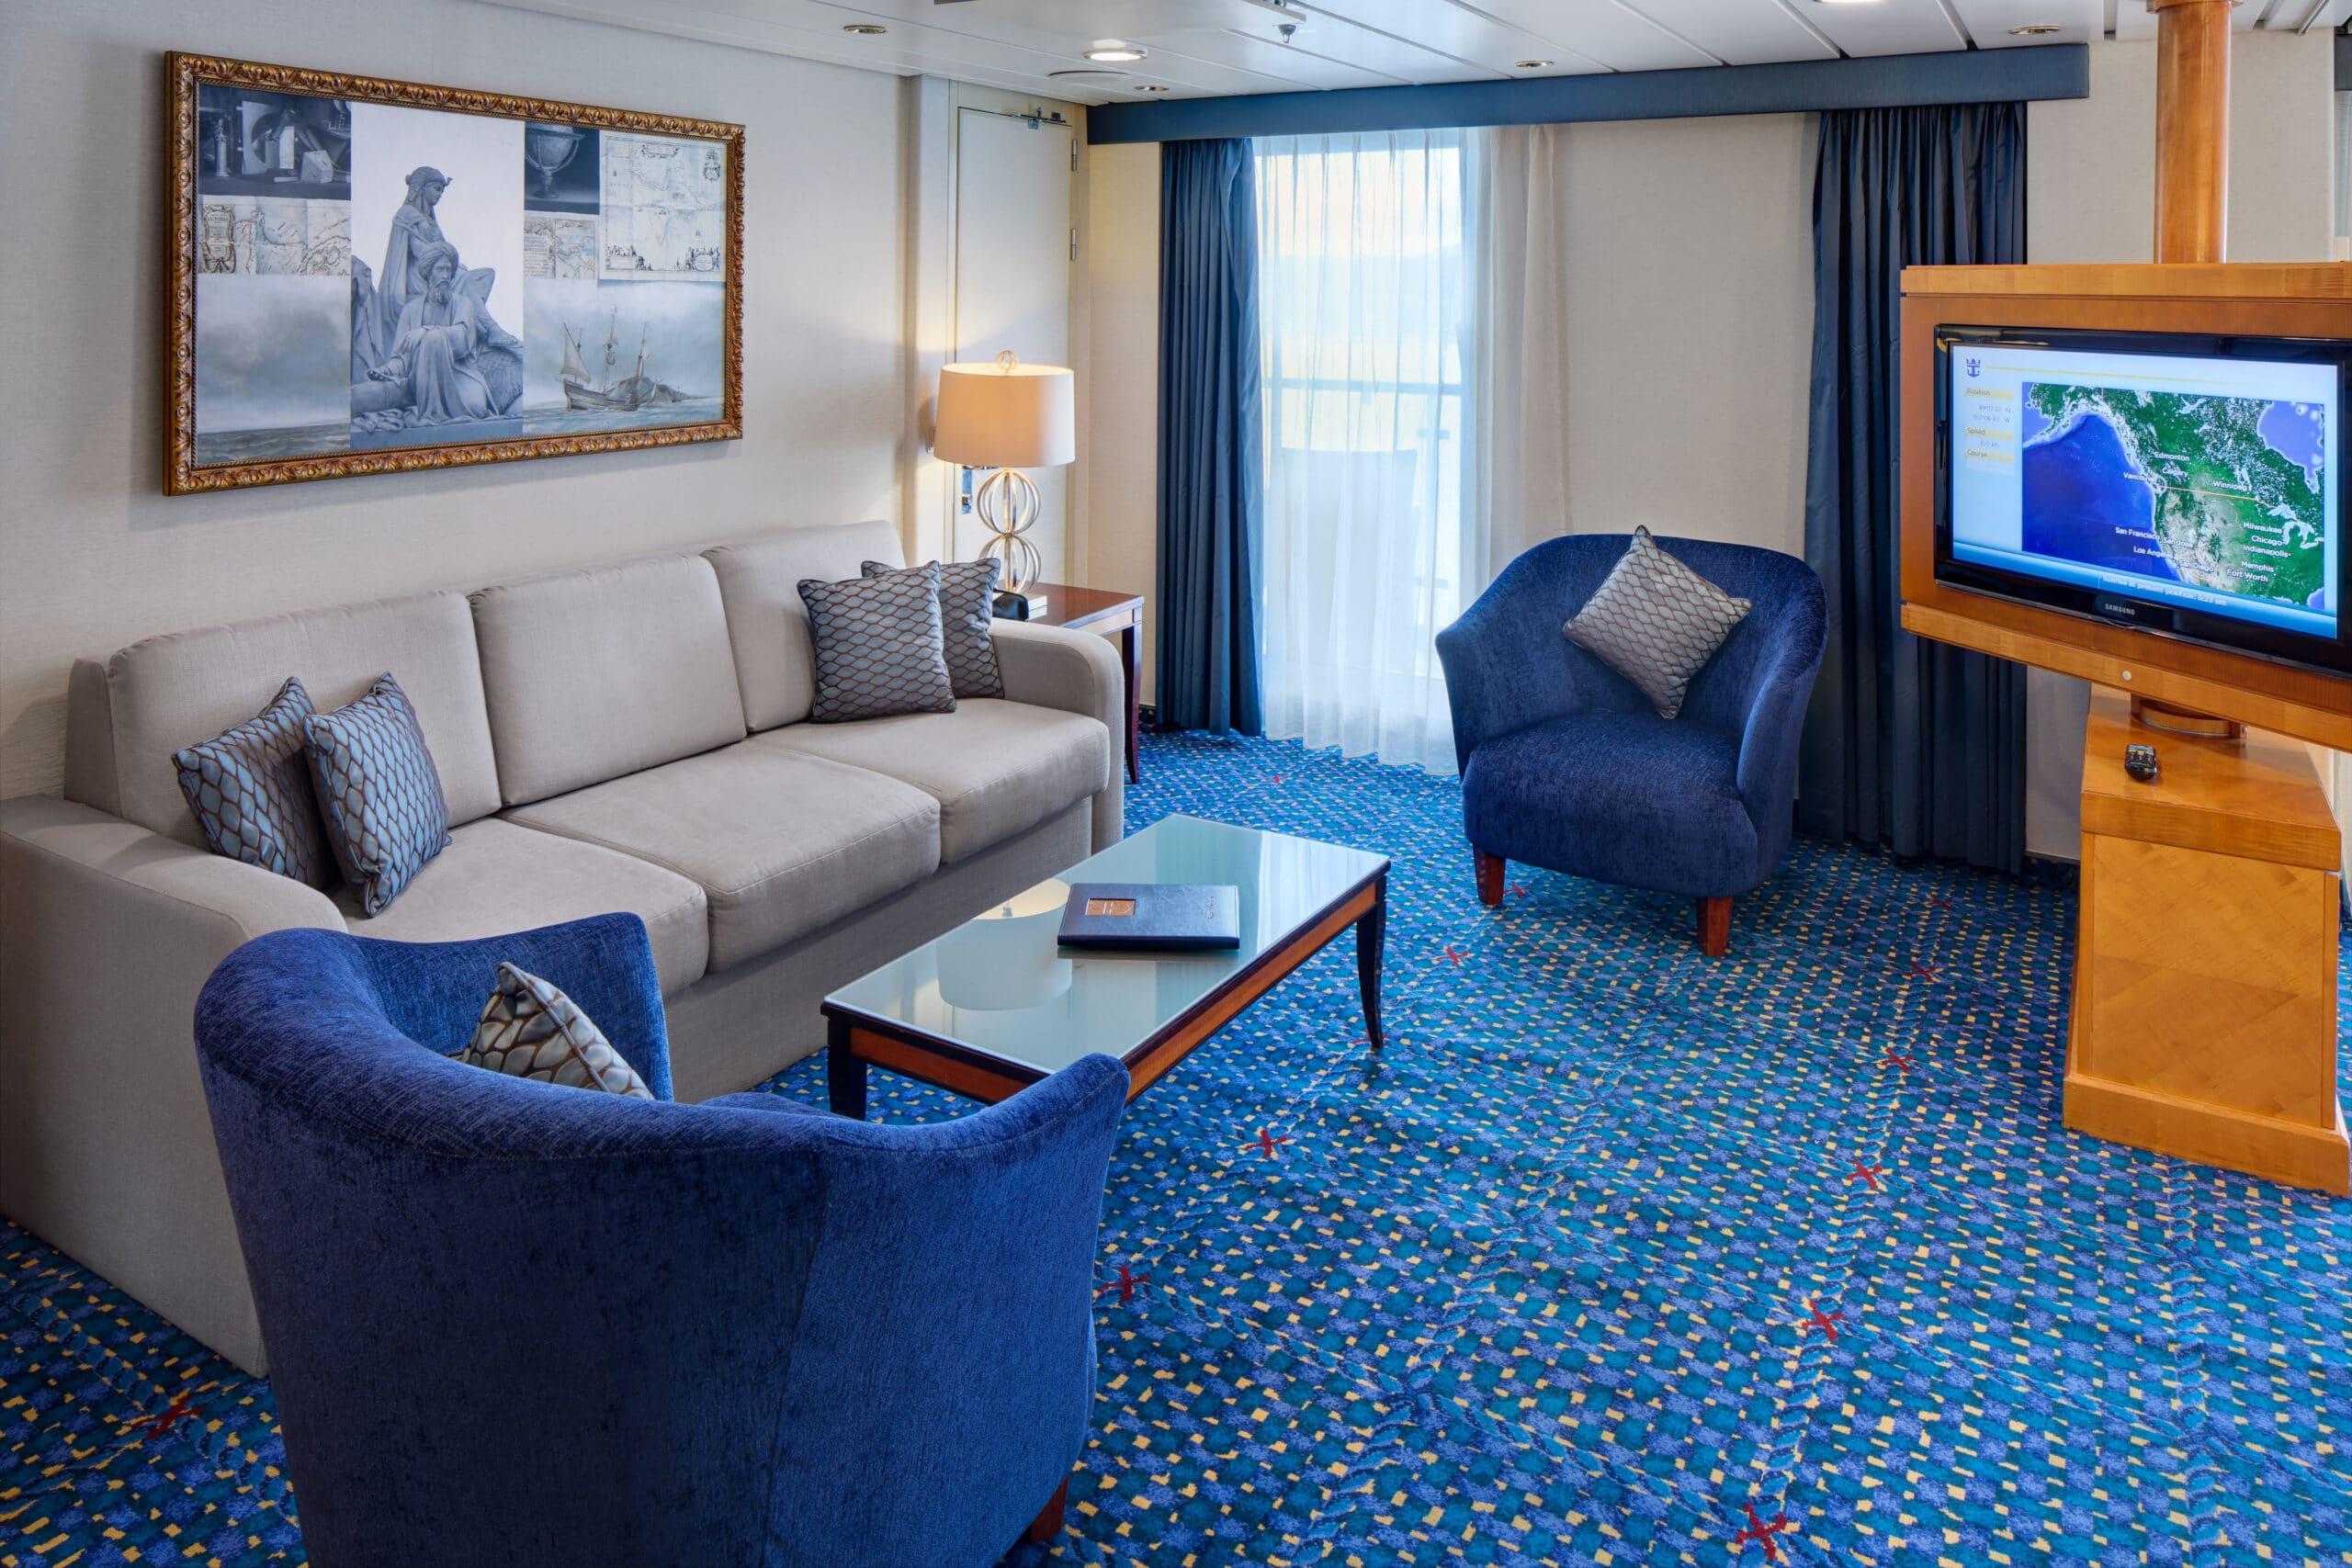 Royal-Caribbean-International-Radiance-of-the-Seas-schip-cruiseschip-categorie-OS-Owner-Suite